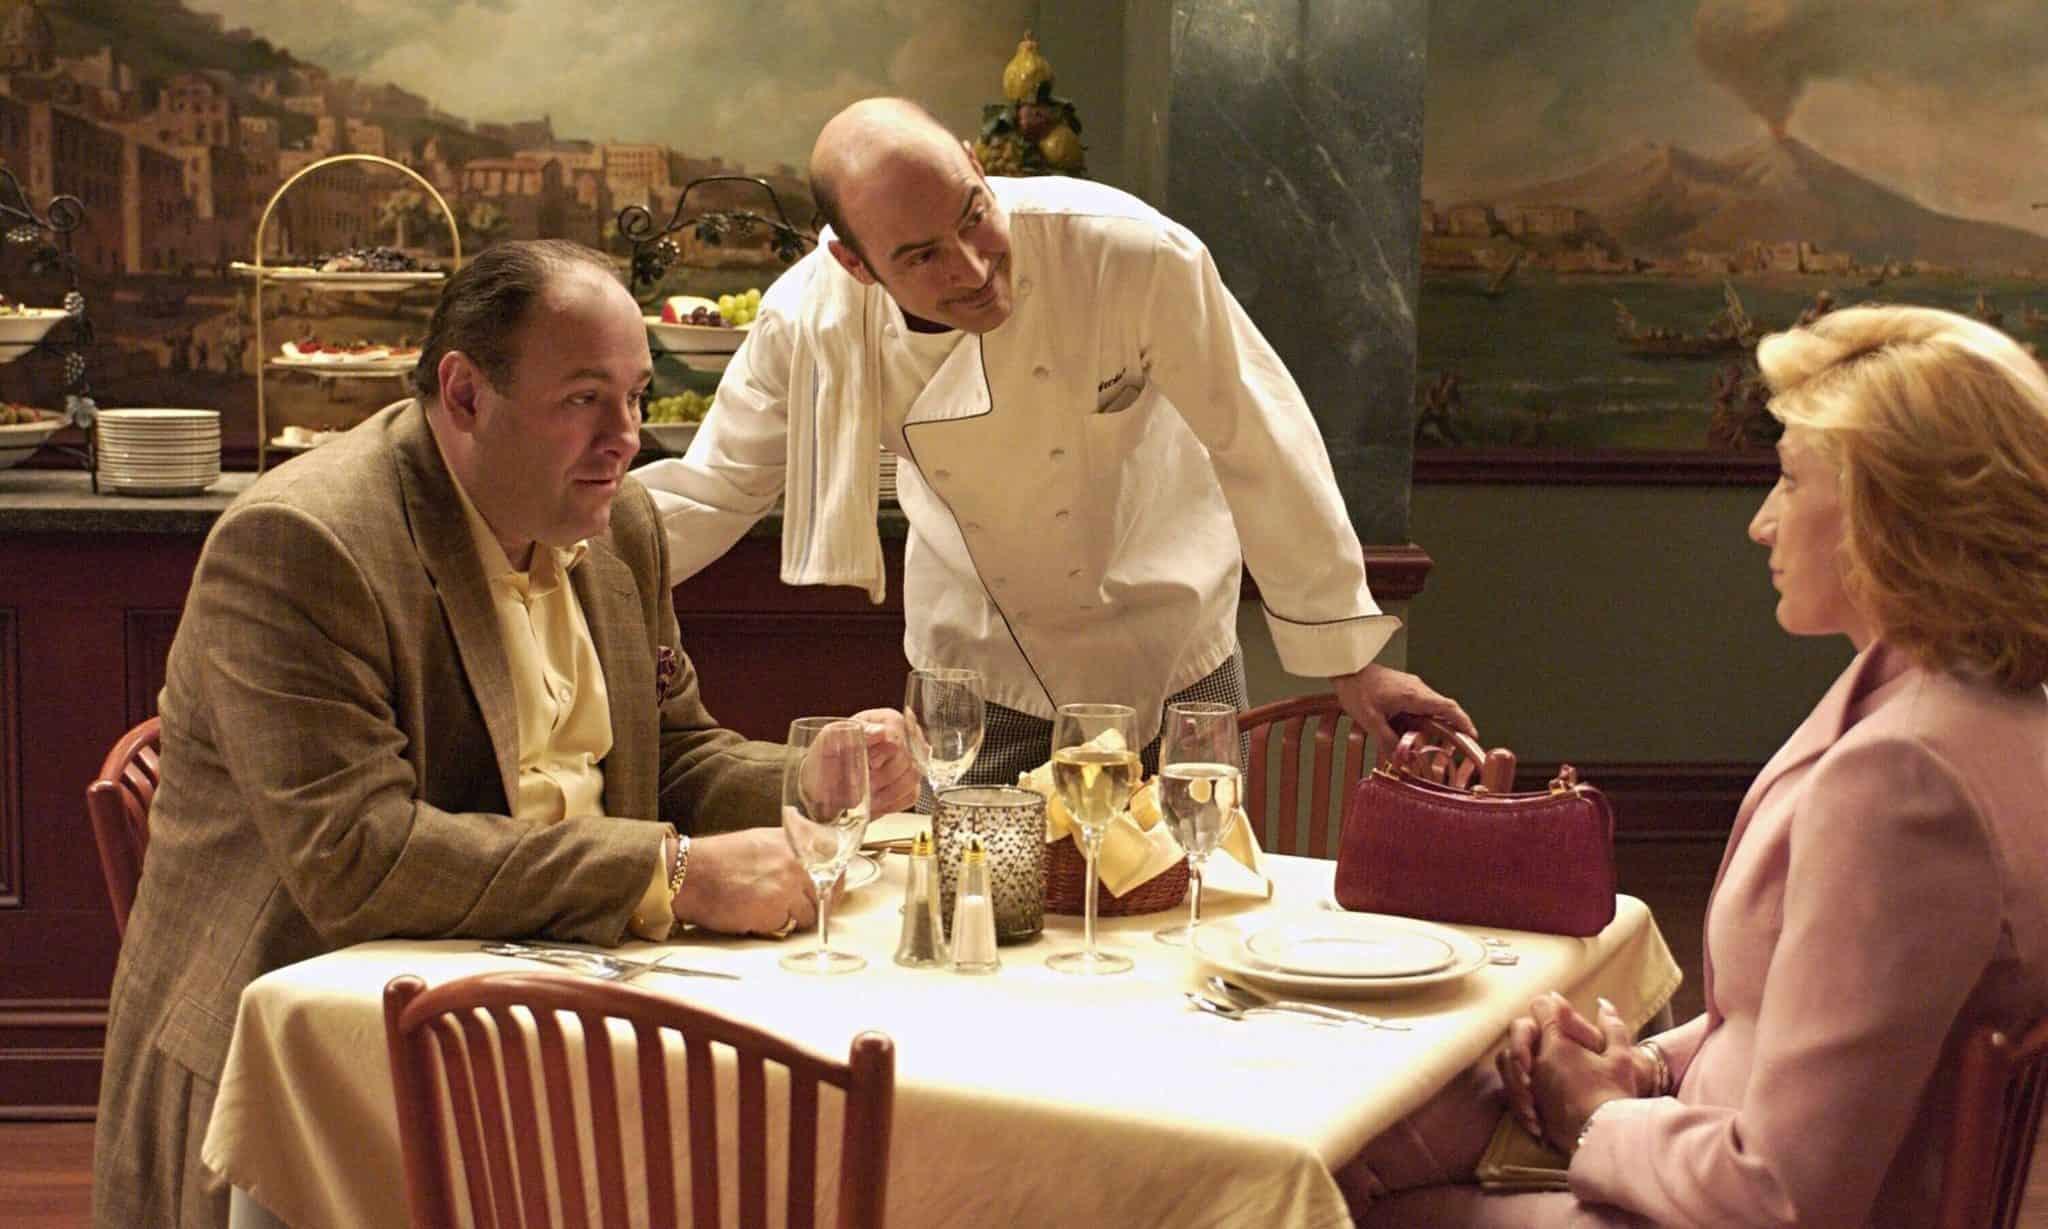 The Sopranos food